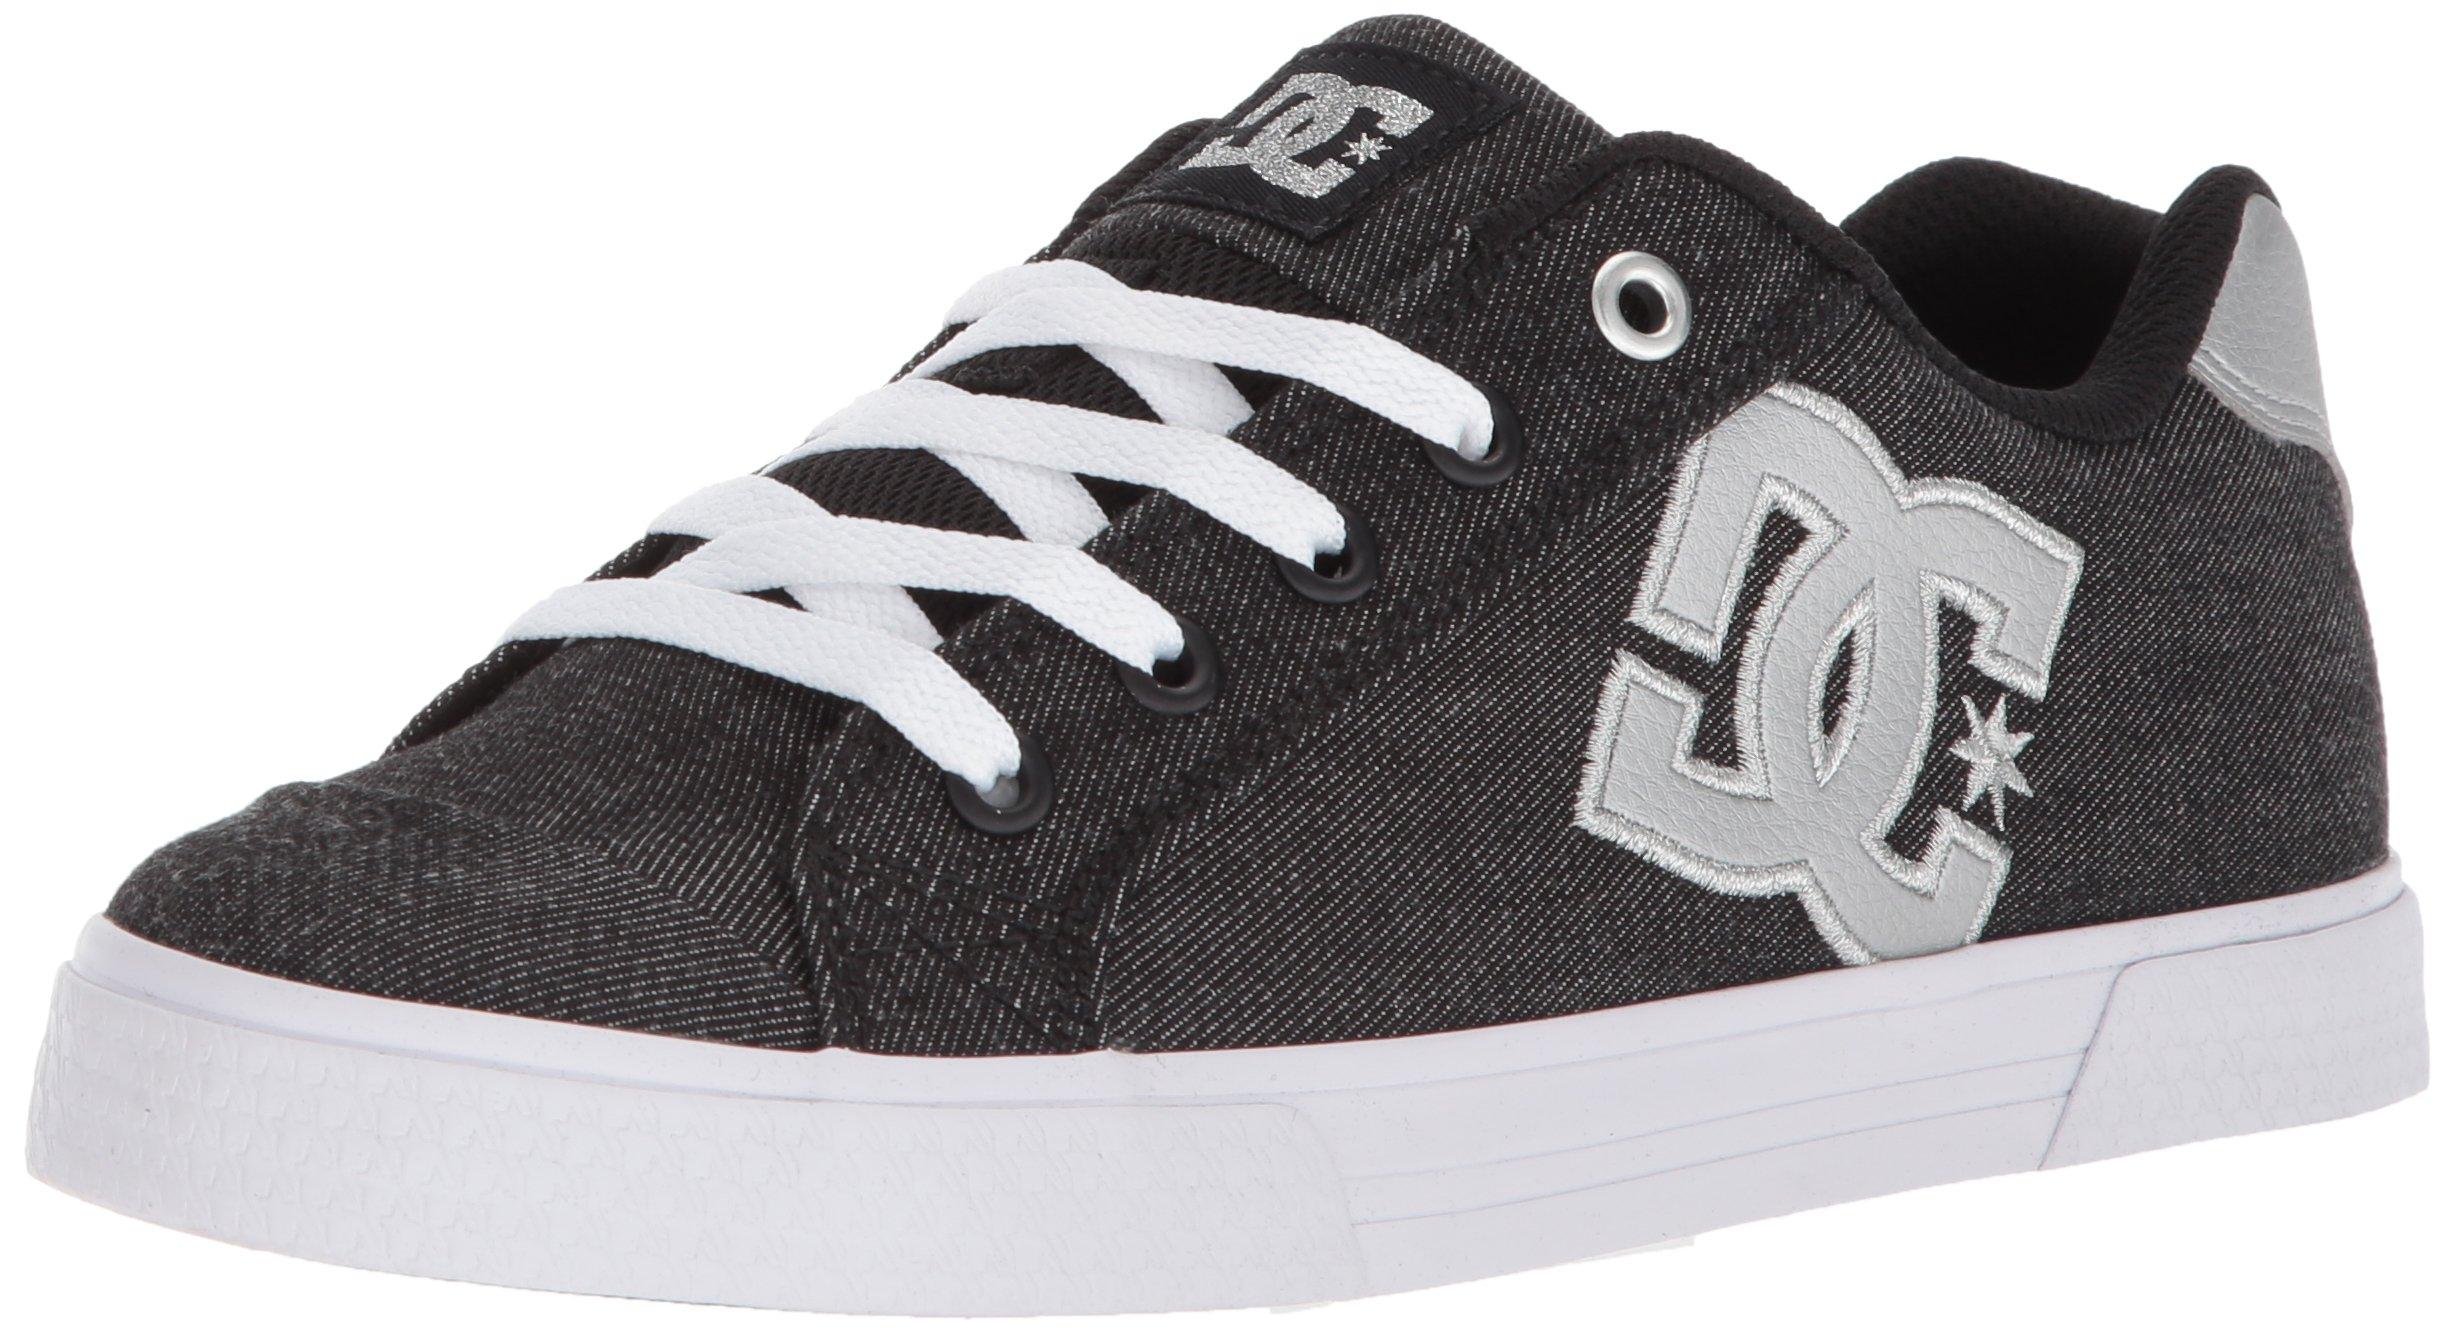 DC Women's Chelsea TX SE Skate Shoe, Black/Anthracite, 7 B US